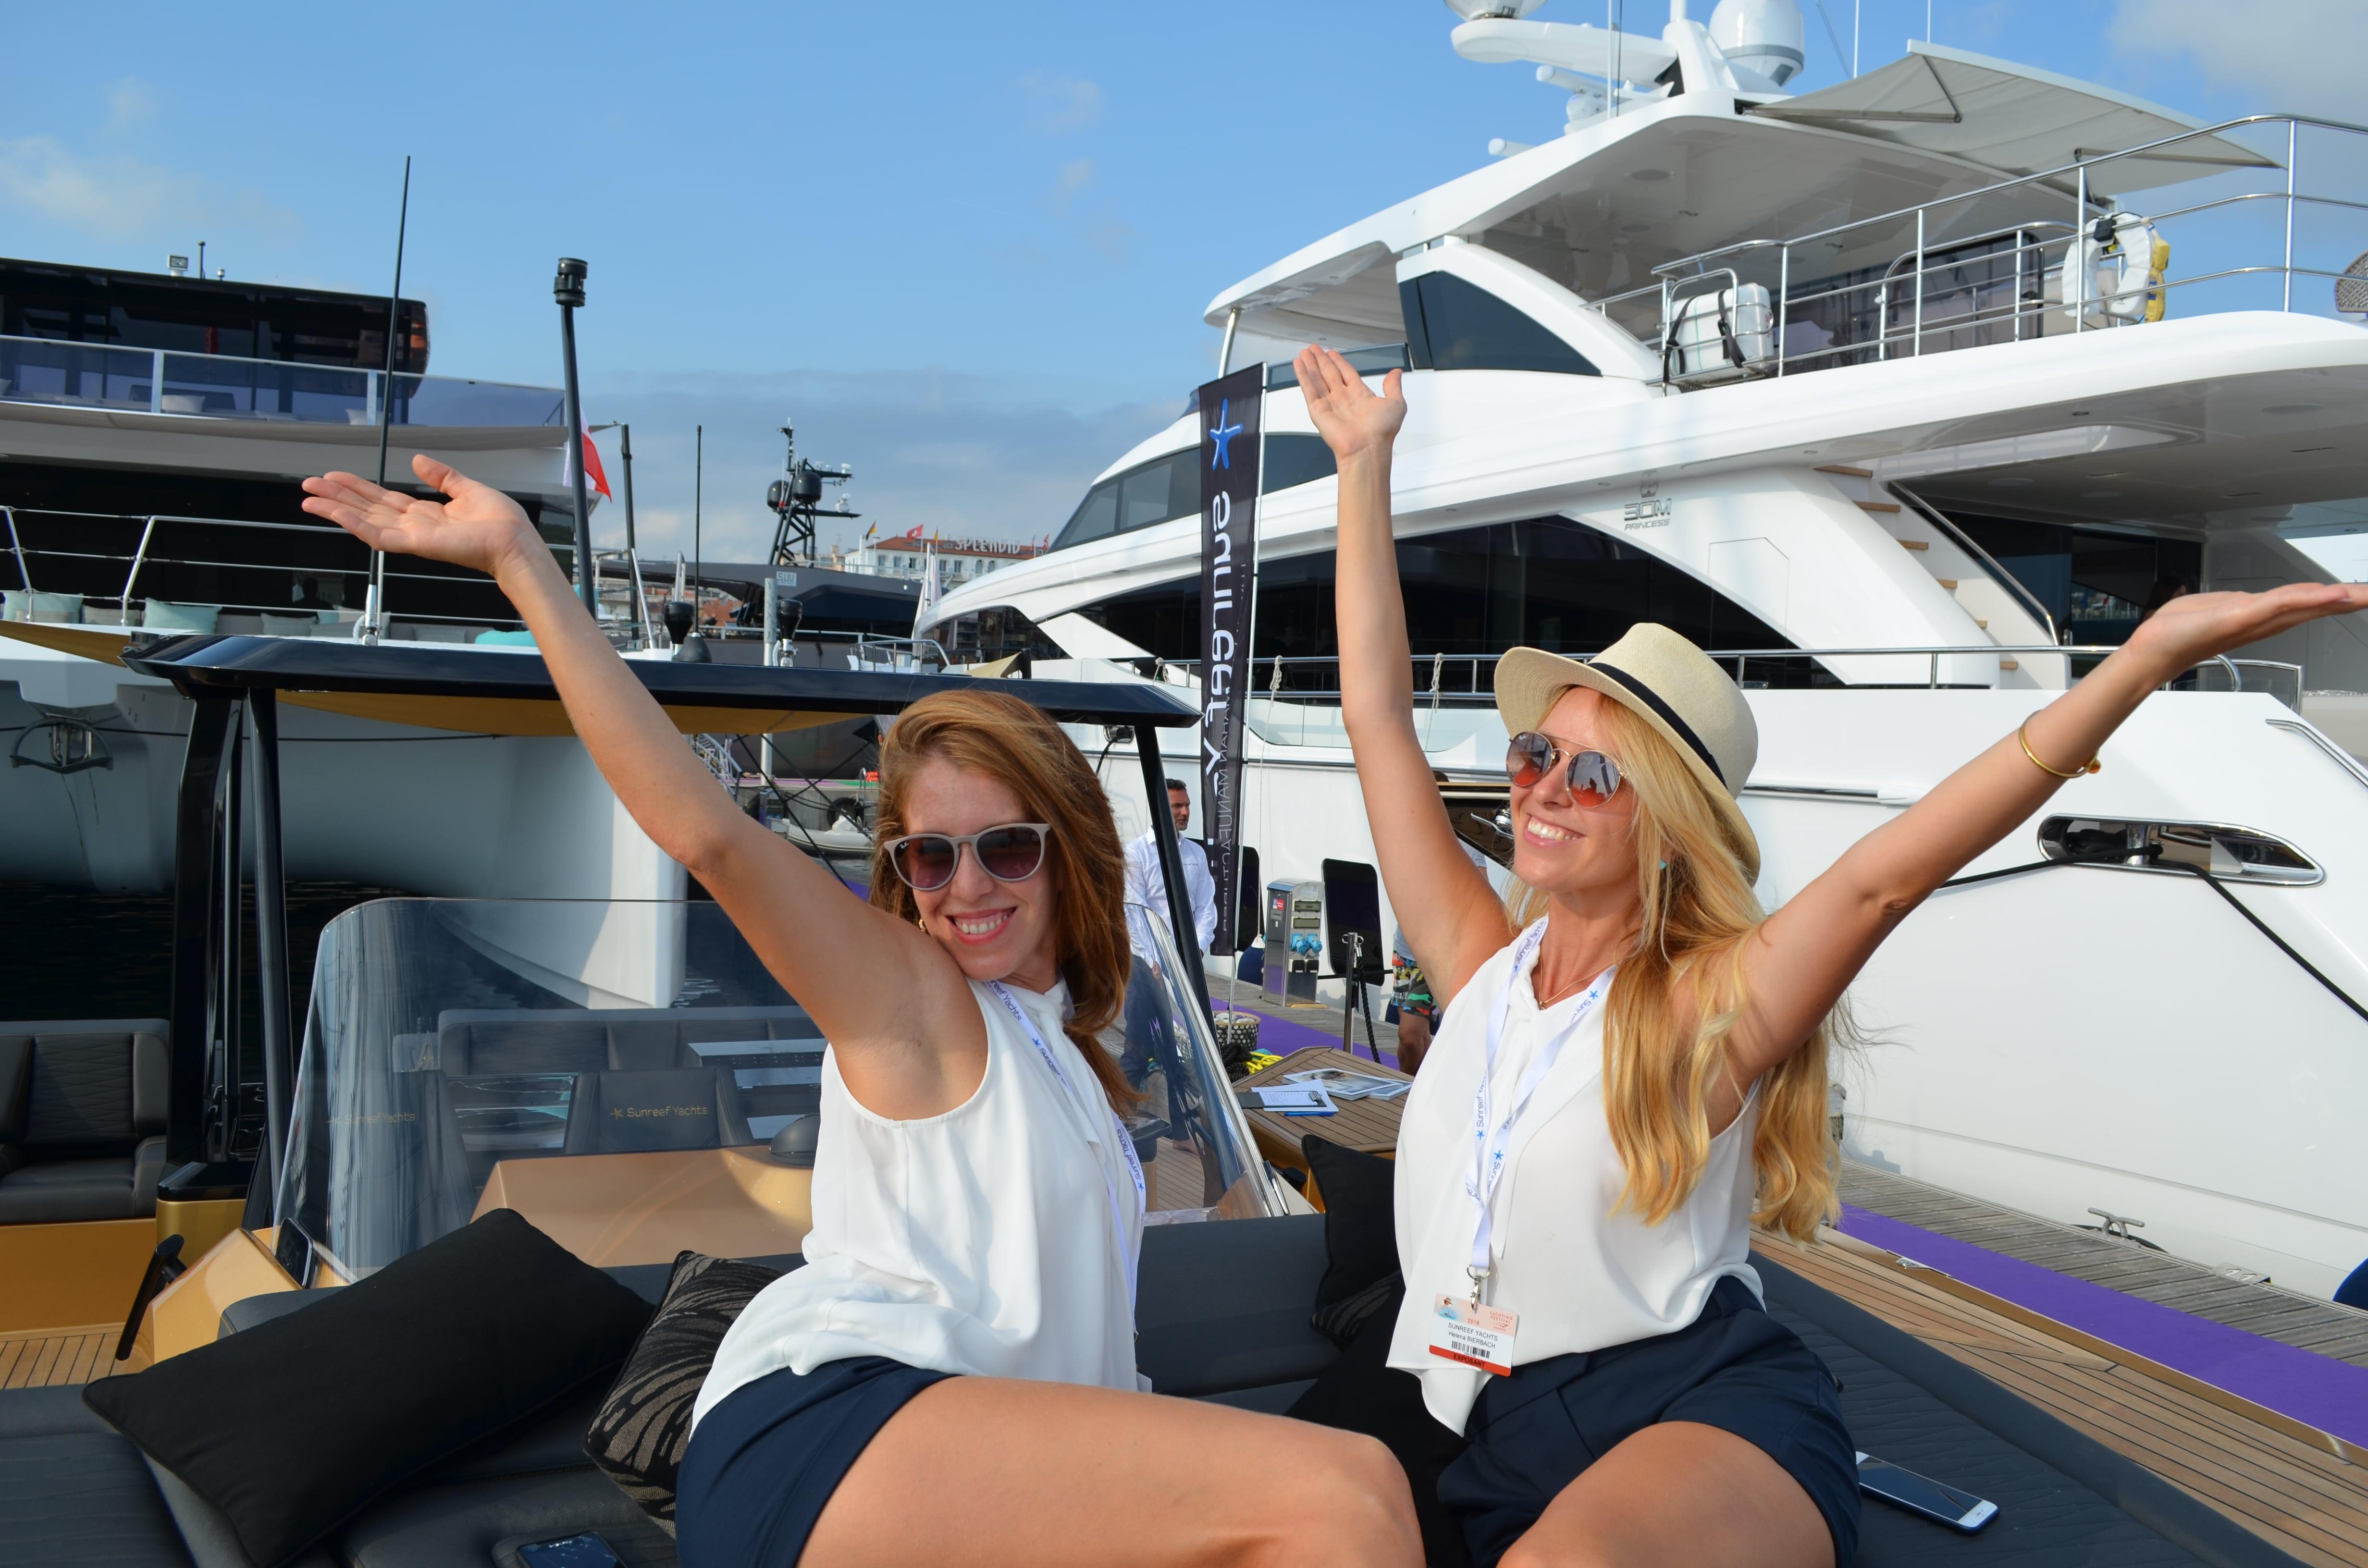 Exhibition Girls Cannes Yacht  U0026 Vip Reception Hostess Agency